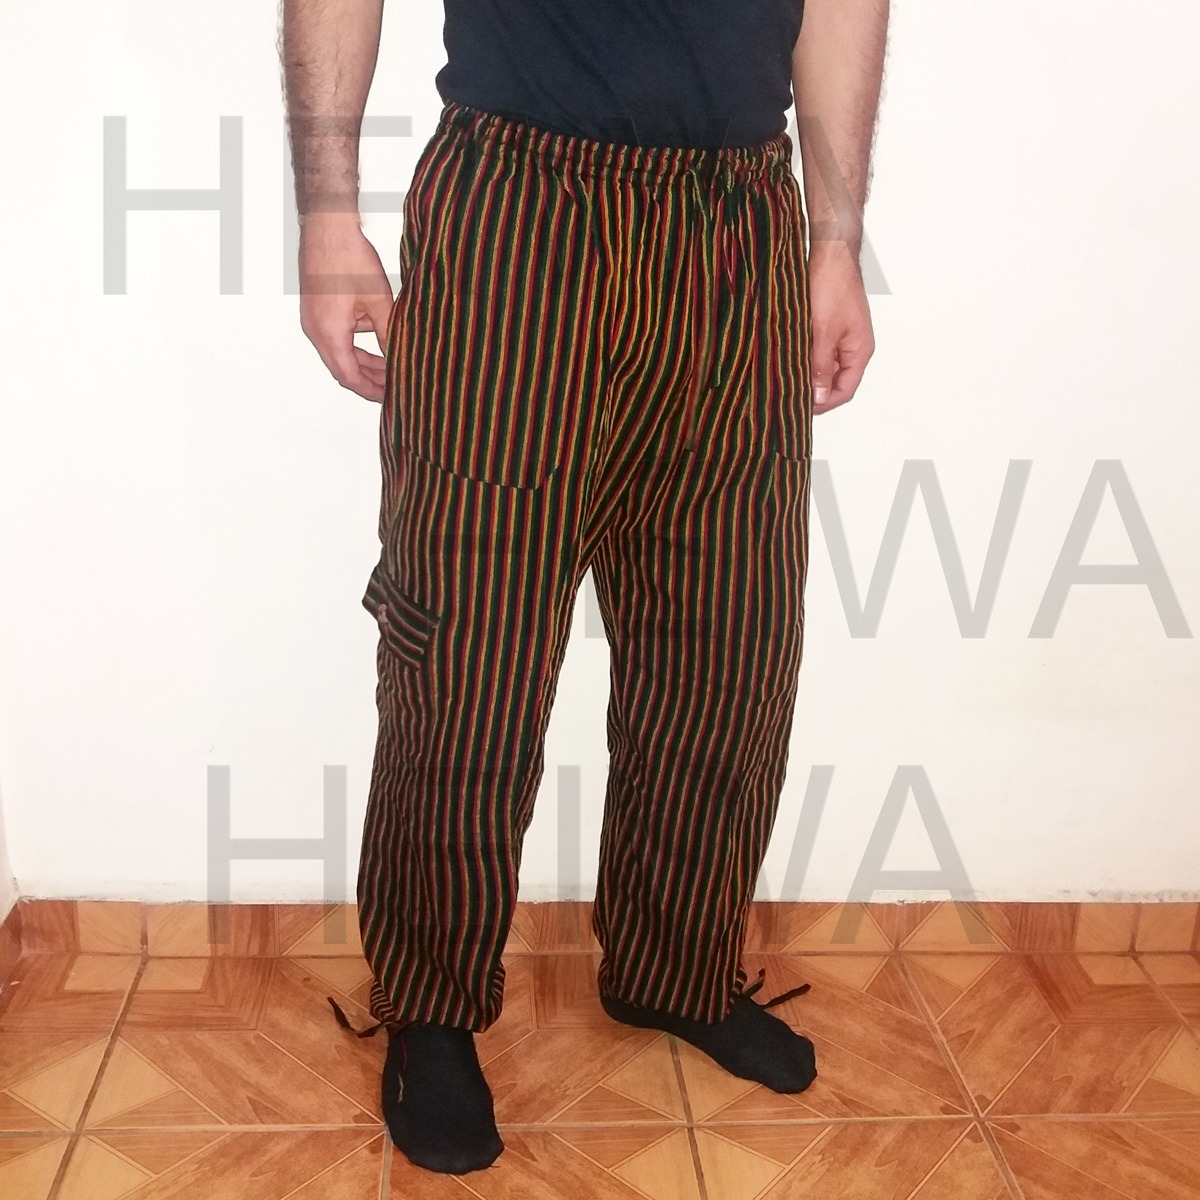 7a0eadd2a6418c Calça G 99cm Pantalona Peruana Boliviana Peru Bolivia Rasta